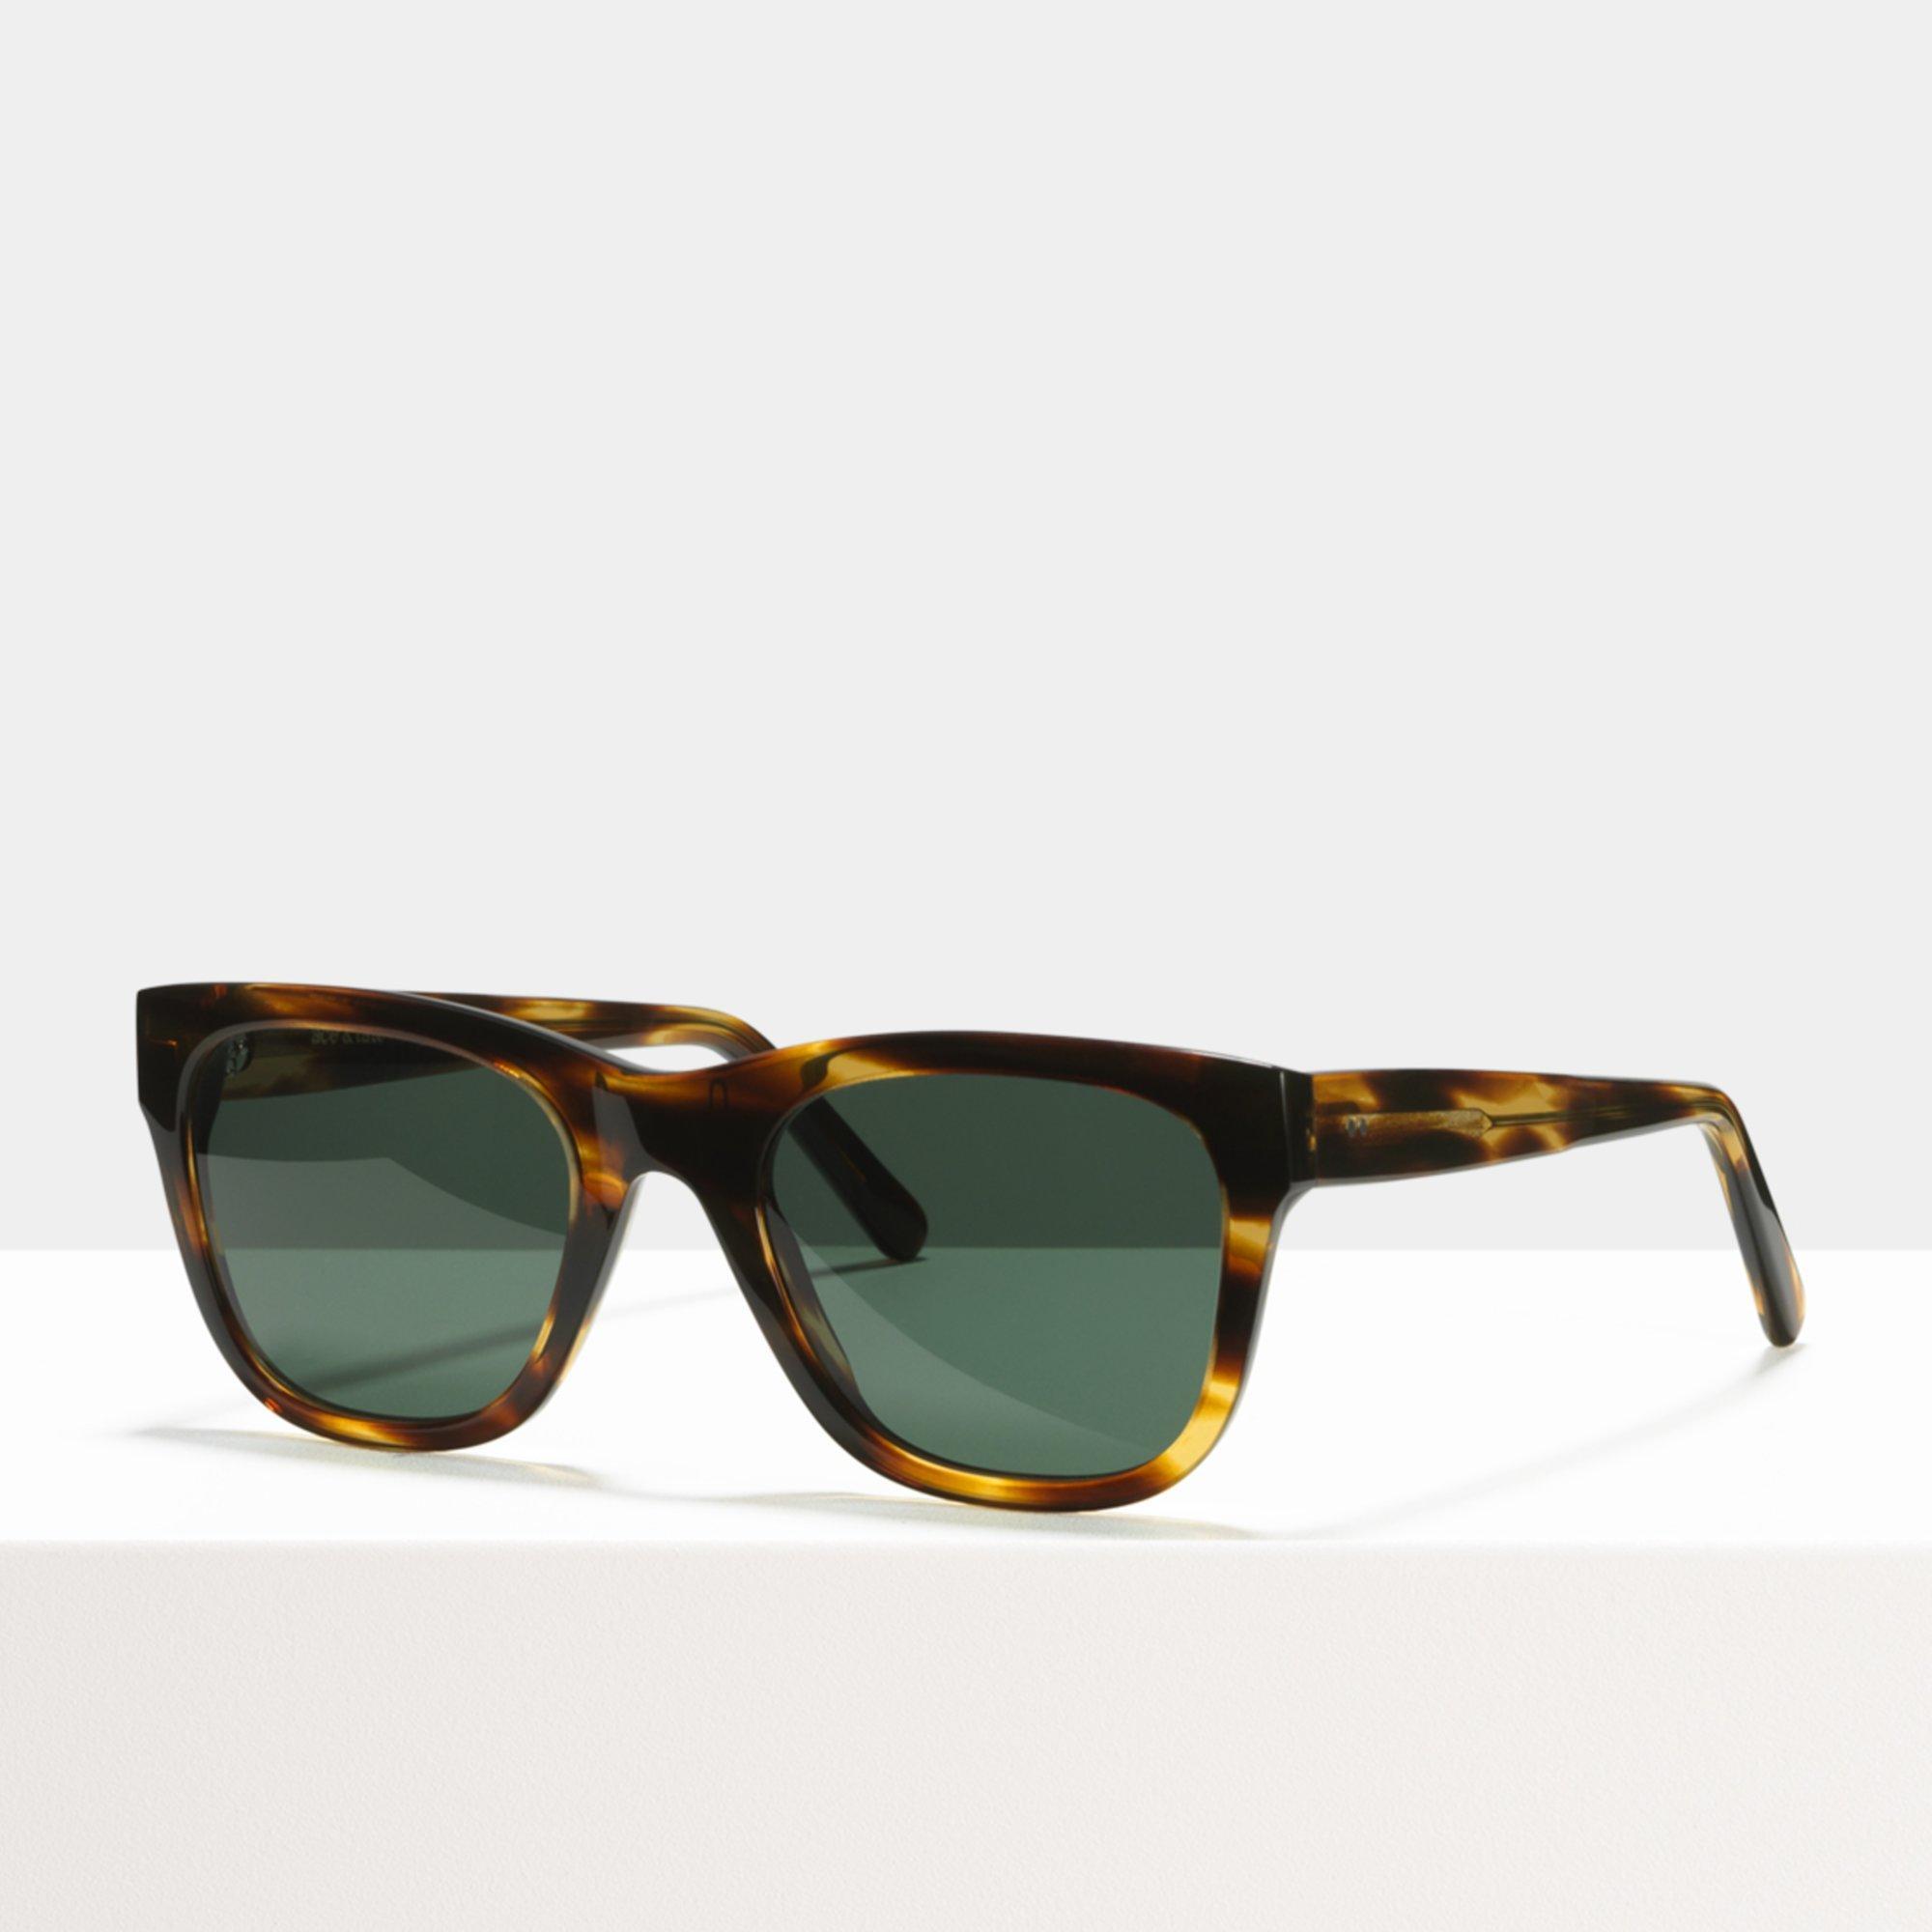 Ace & Tate Sunglasses   rectangle acetate in Brown, Orange